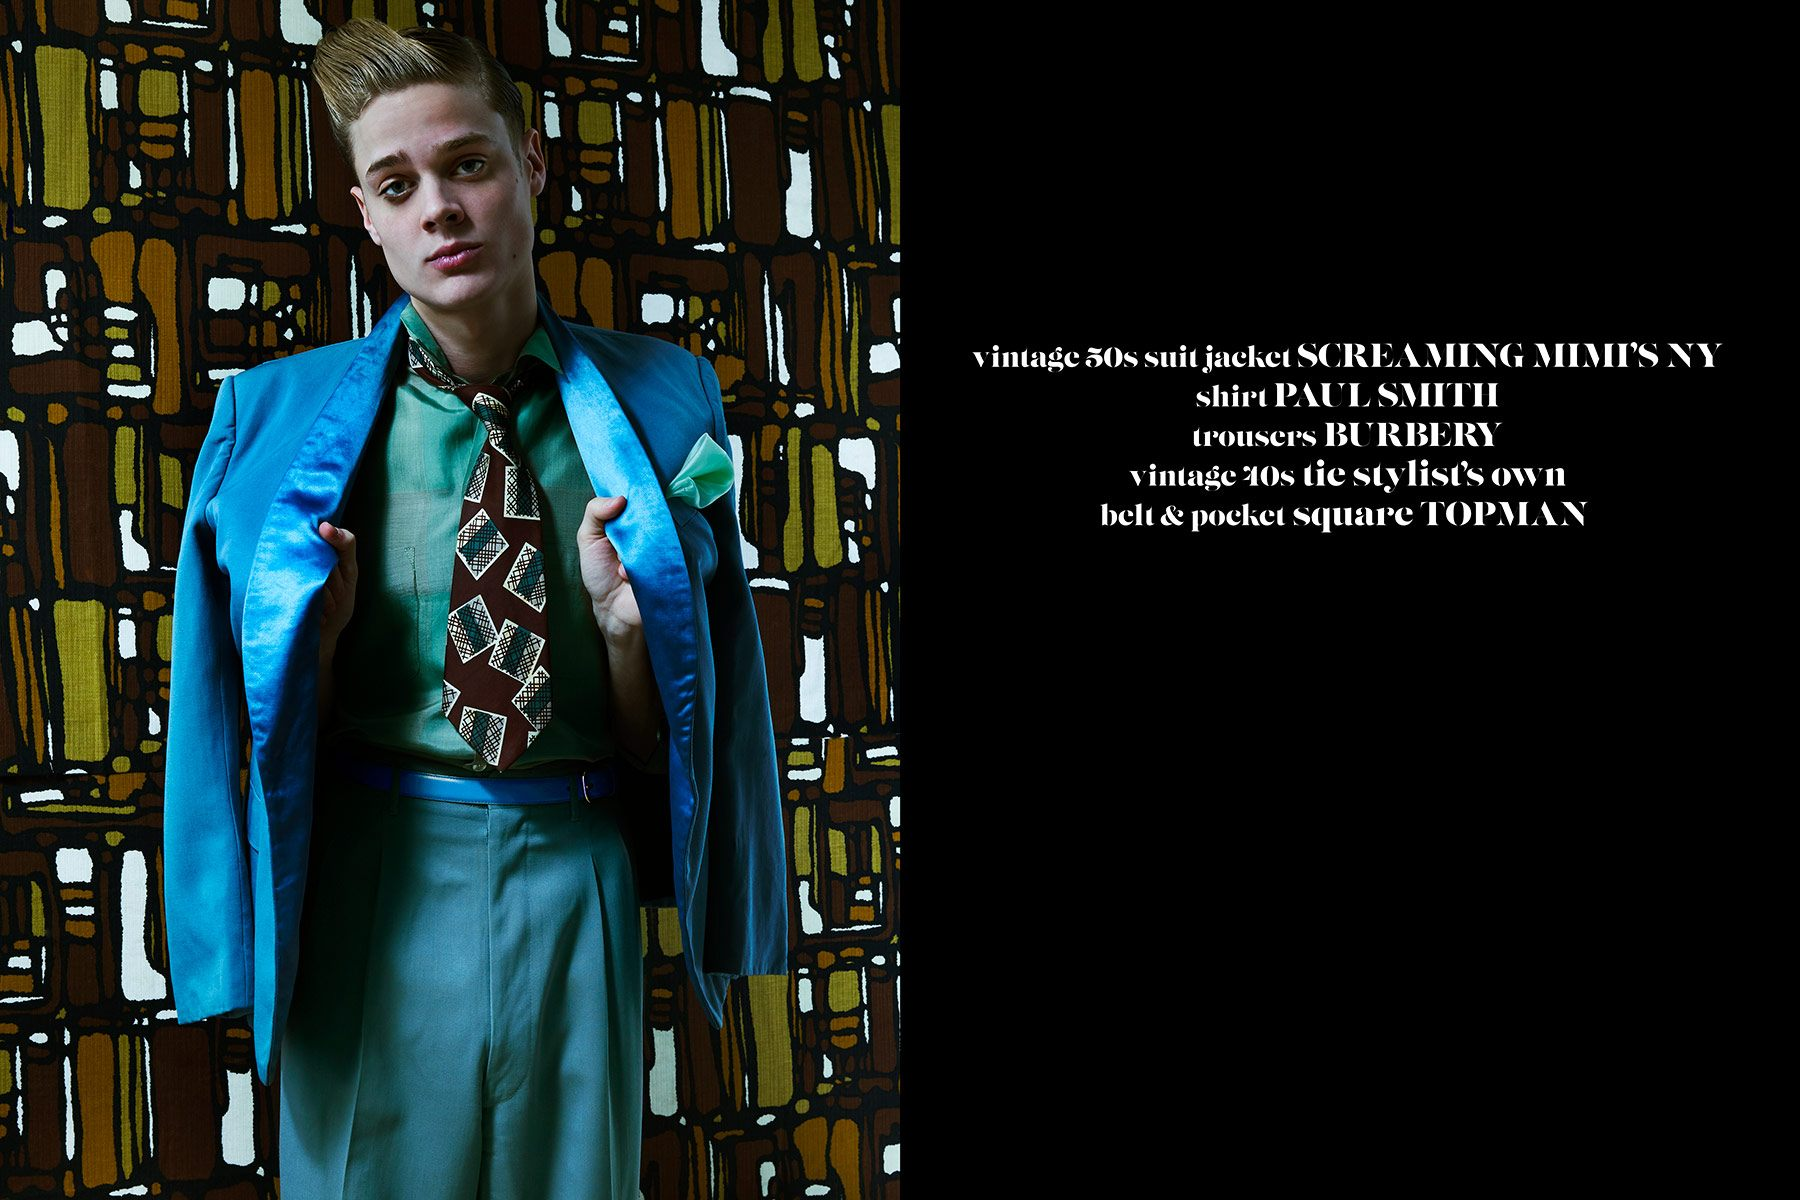 Male model Jake Lauria photographed by Alexander Thompson for Ponyboy magazine.